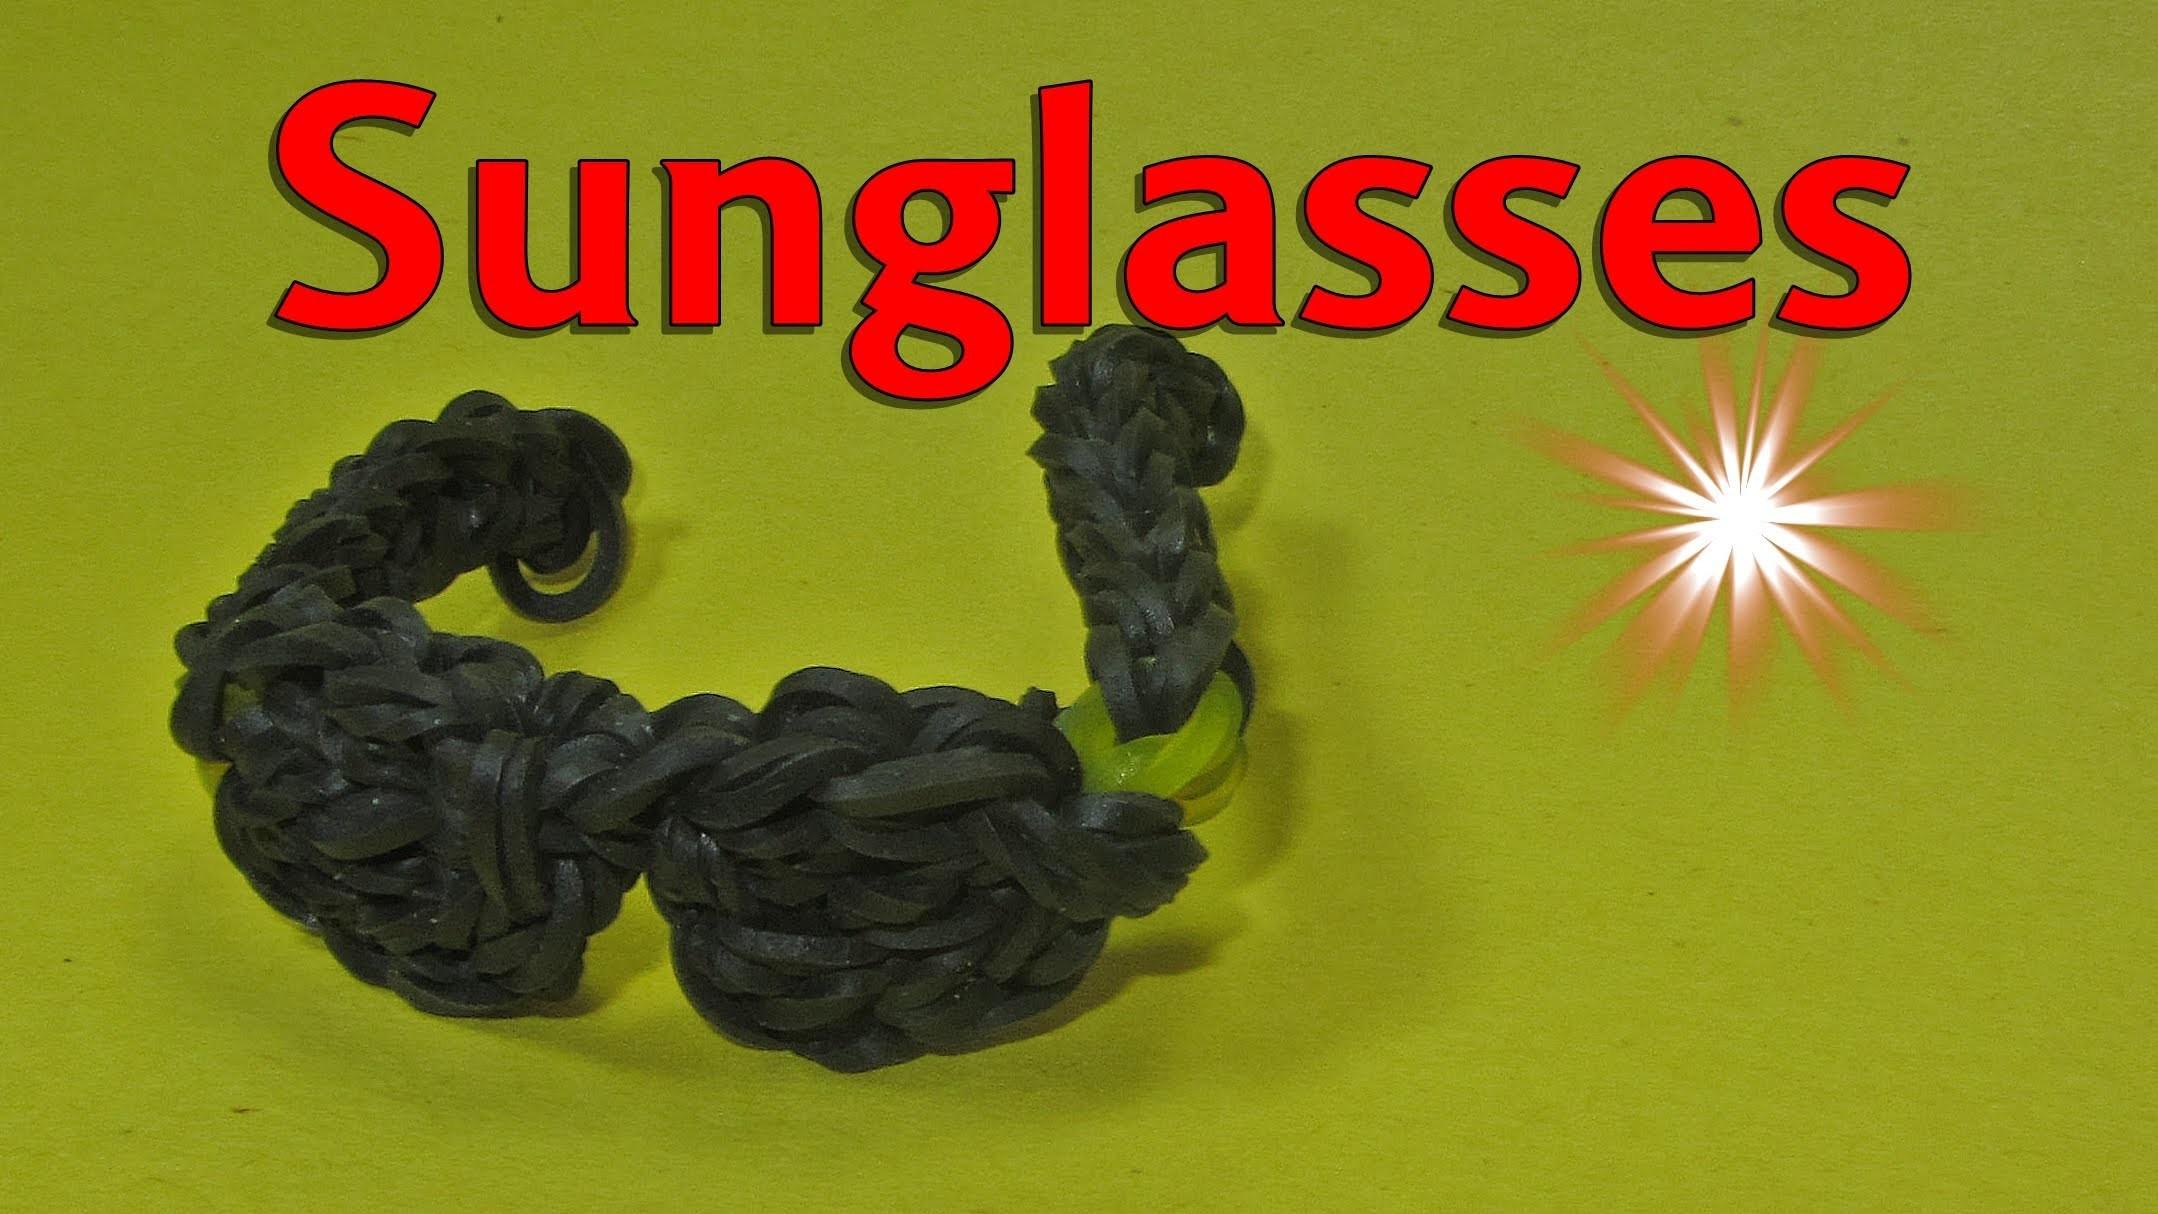 Rainbow Loom: Sunglasses: How to Design. Tutorial